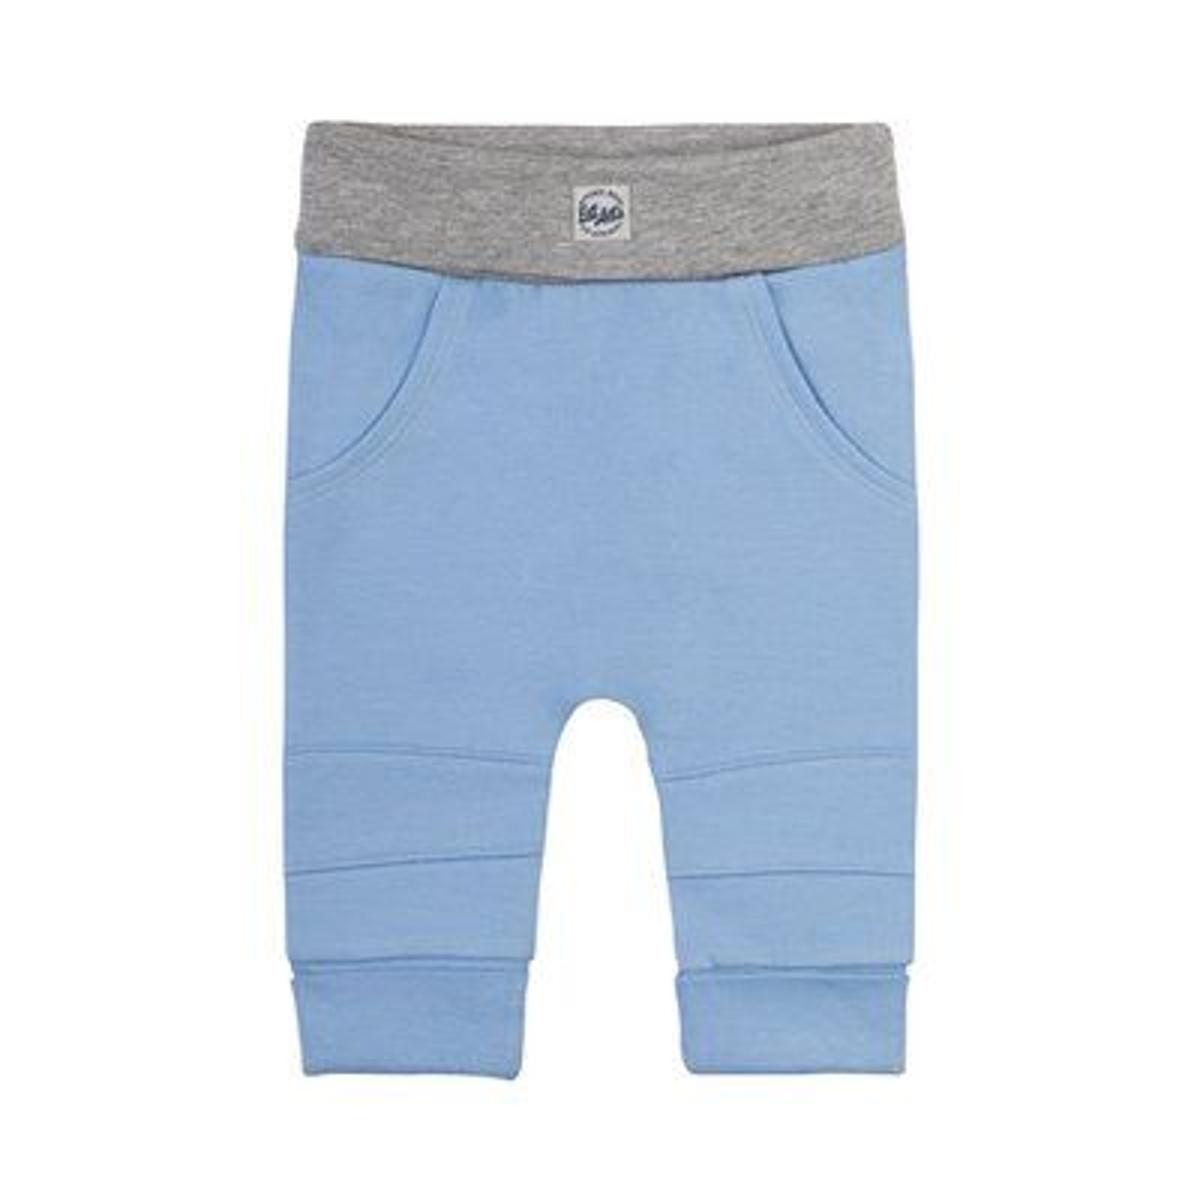 SANETTA Le pantalon de jogging pantalon bébé pantalon enfant